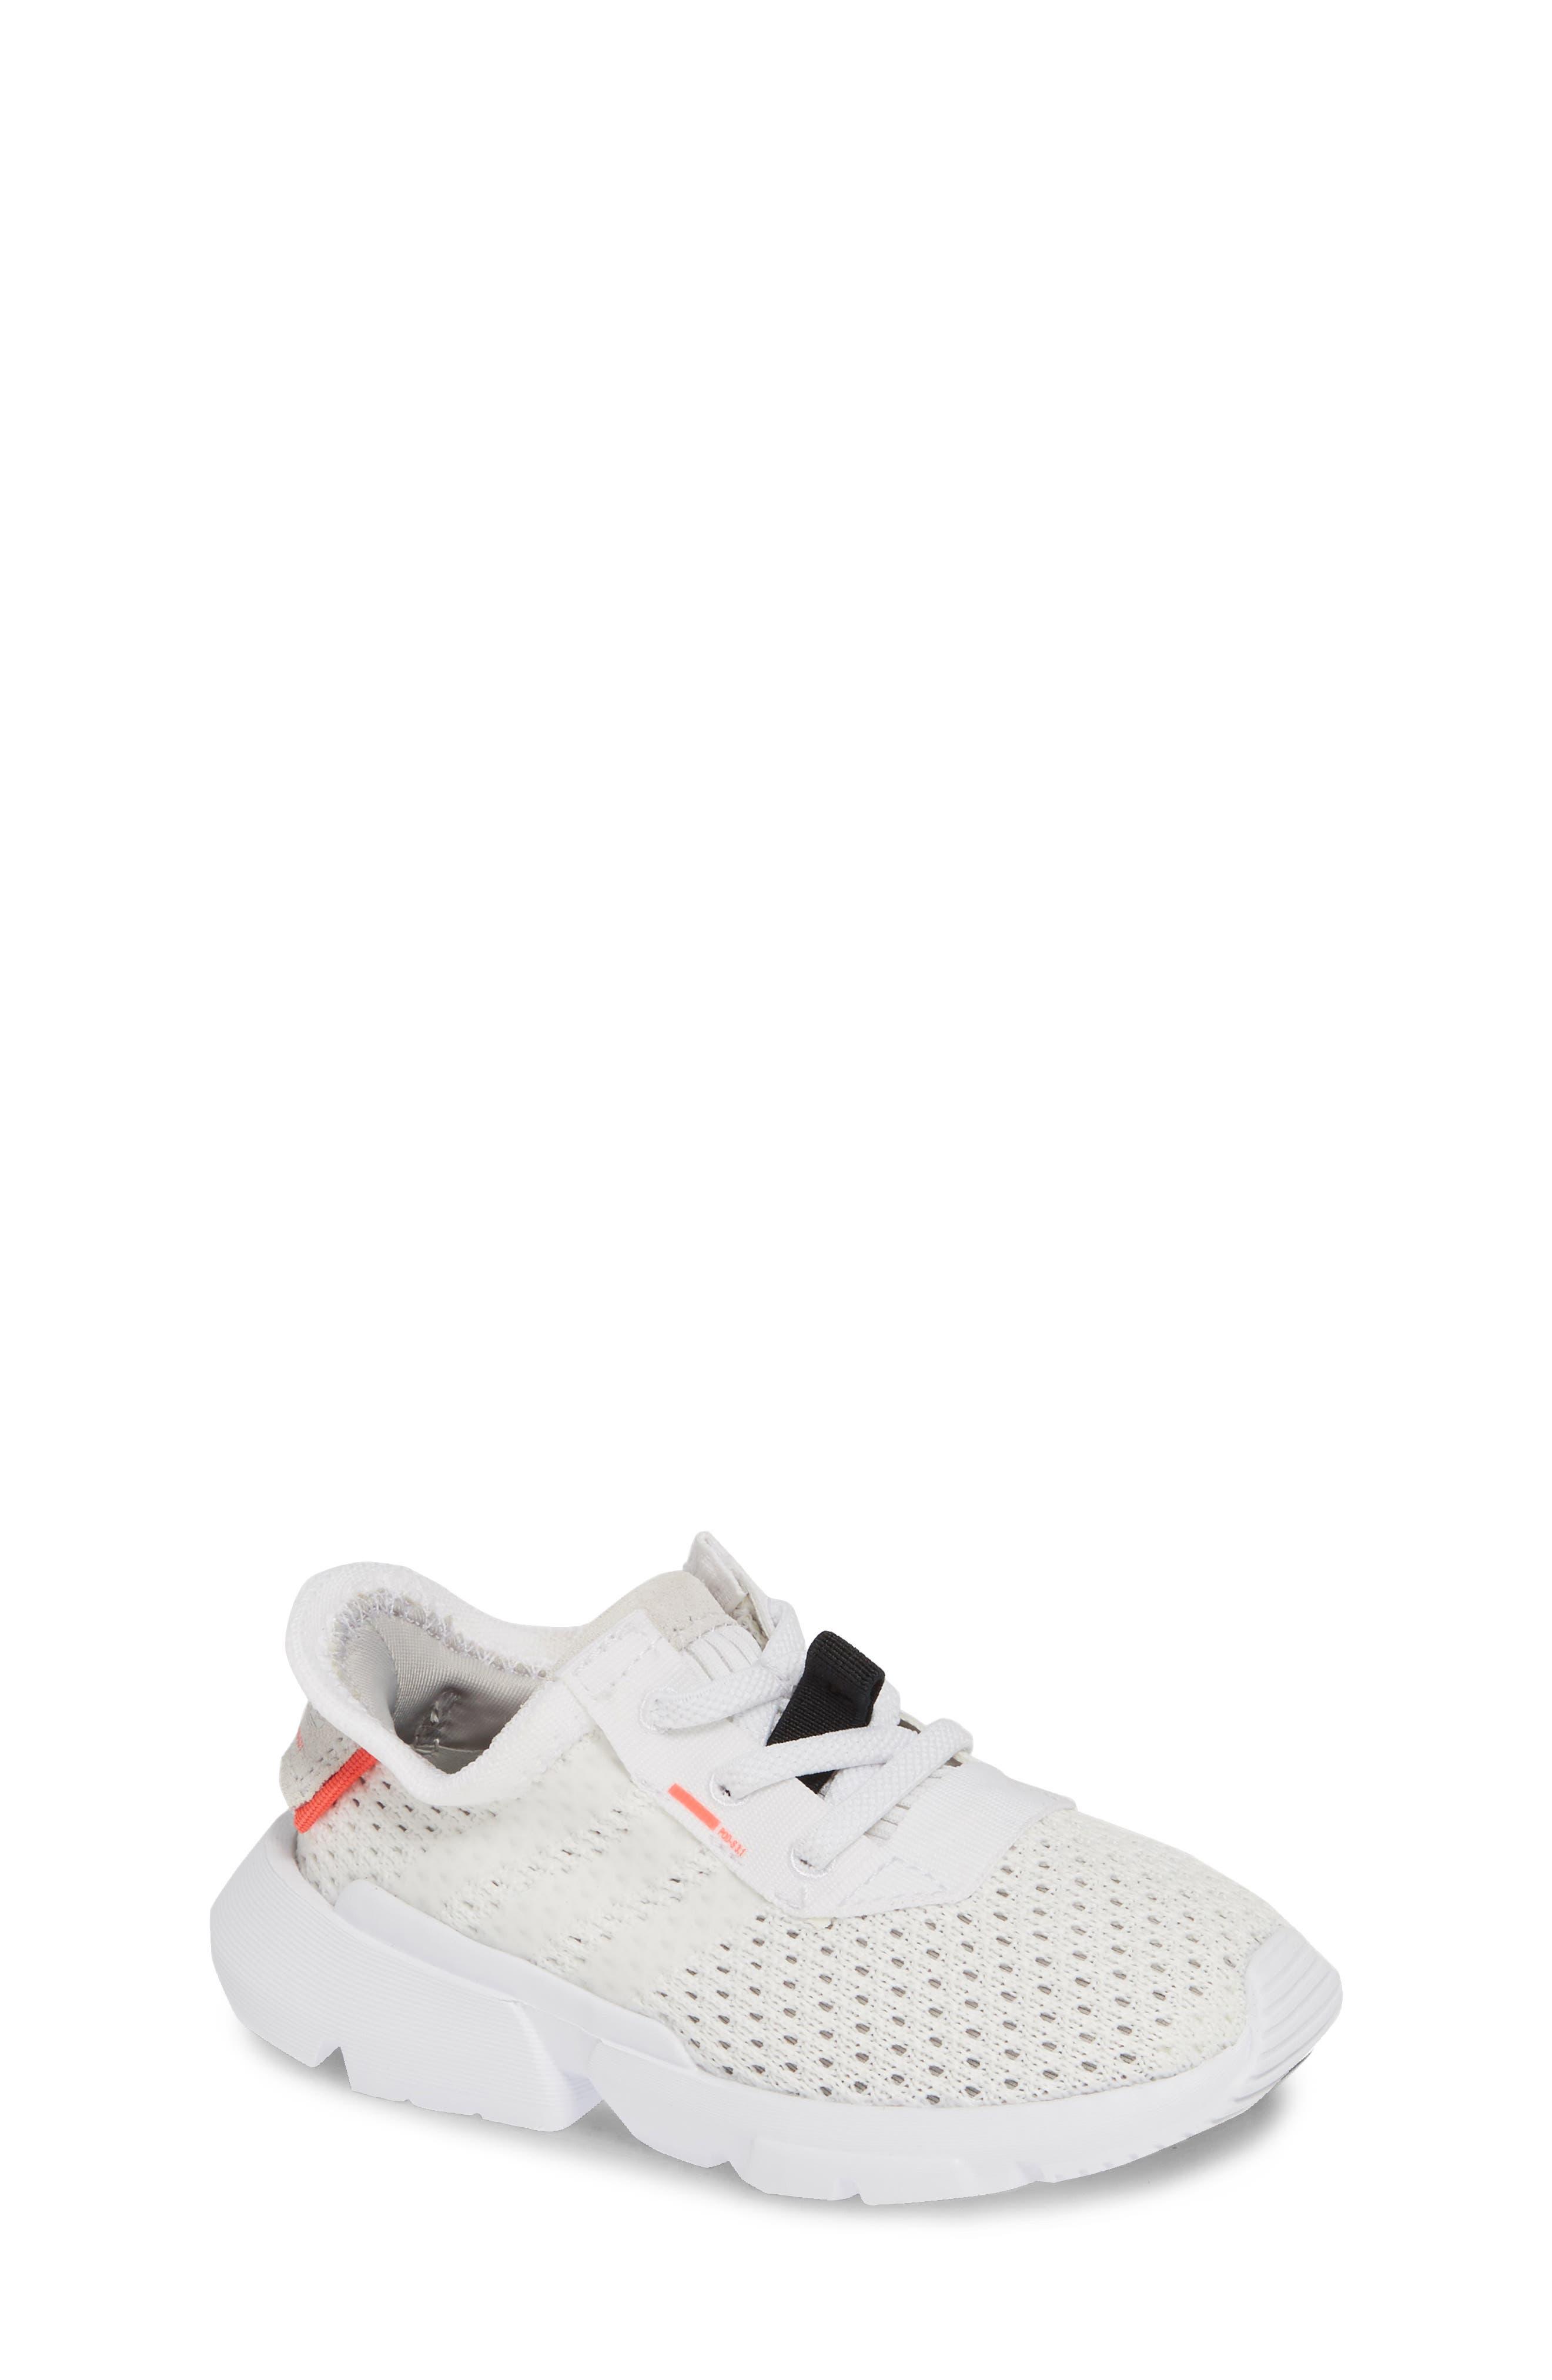 ADIDAS, POD-S3.1 Sneaker, Main thumbnail 1, color, WHITE/ WHITE/ SHOCK RED